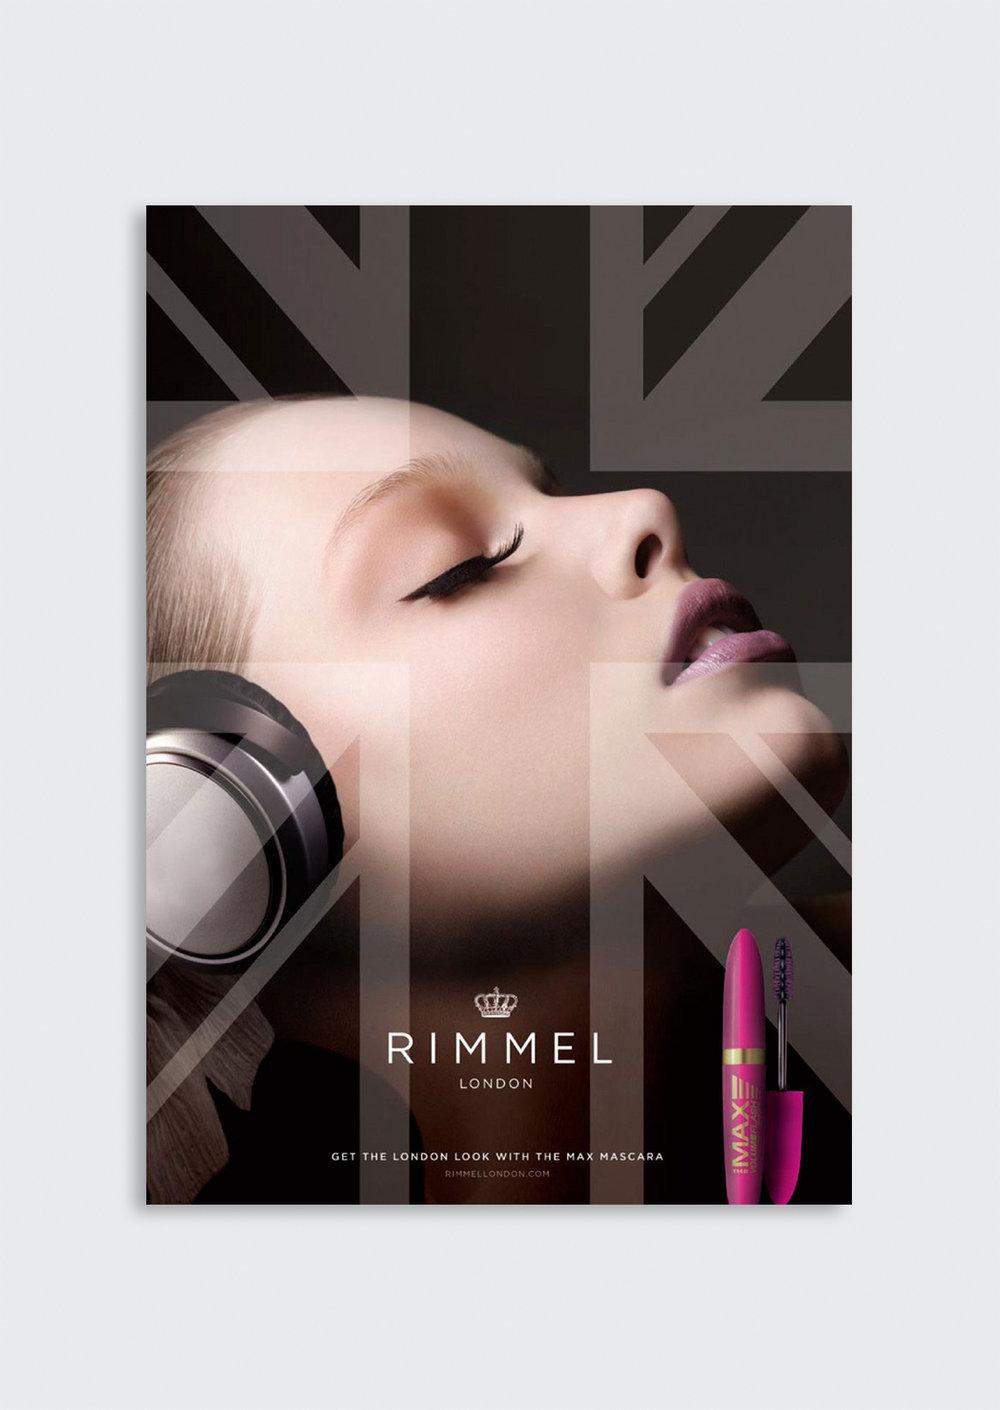 Rimmel 3 Grey.jpg